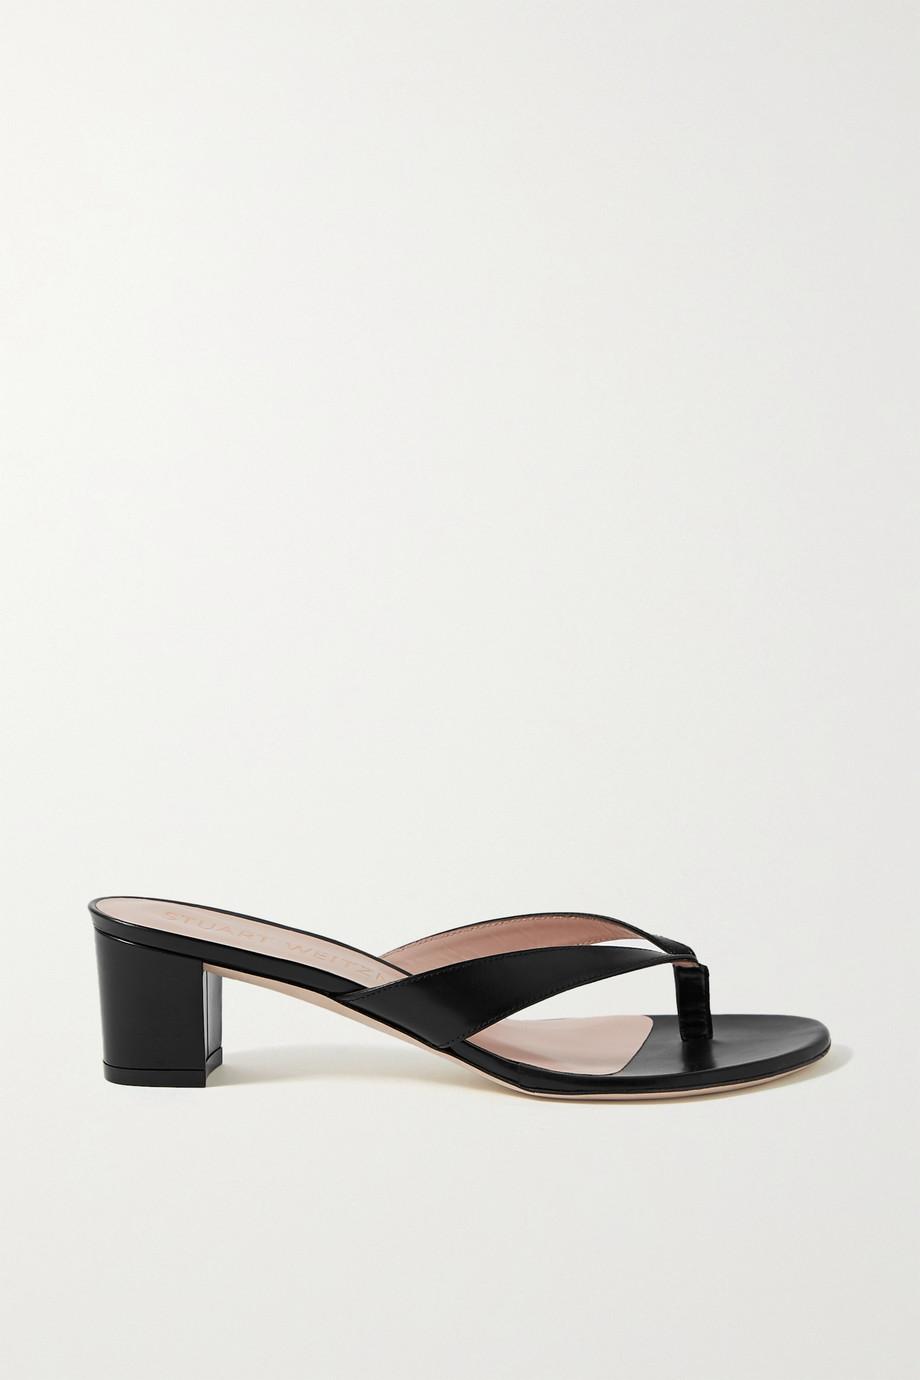 Stuart Weitzman Brigida leather sandals